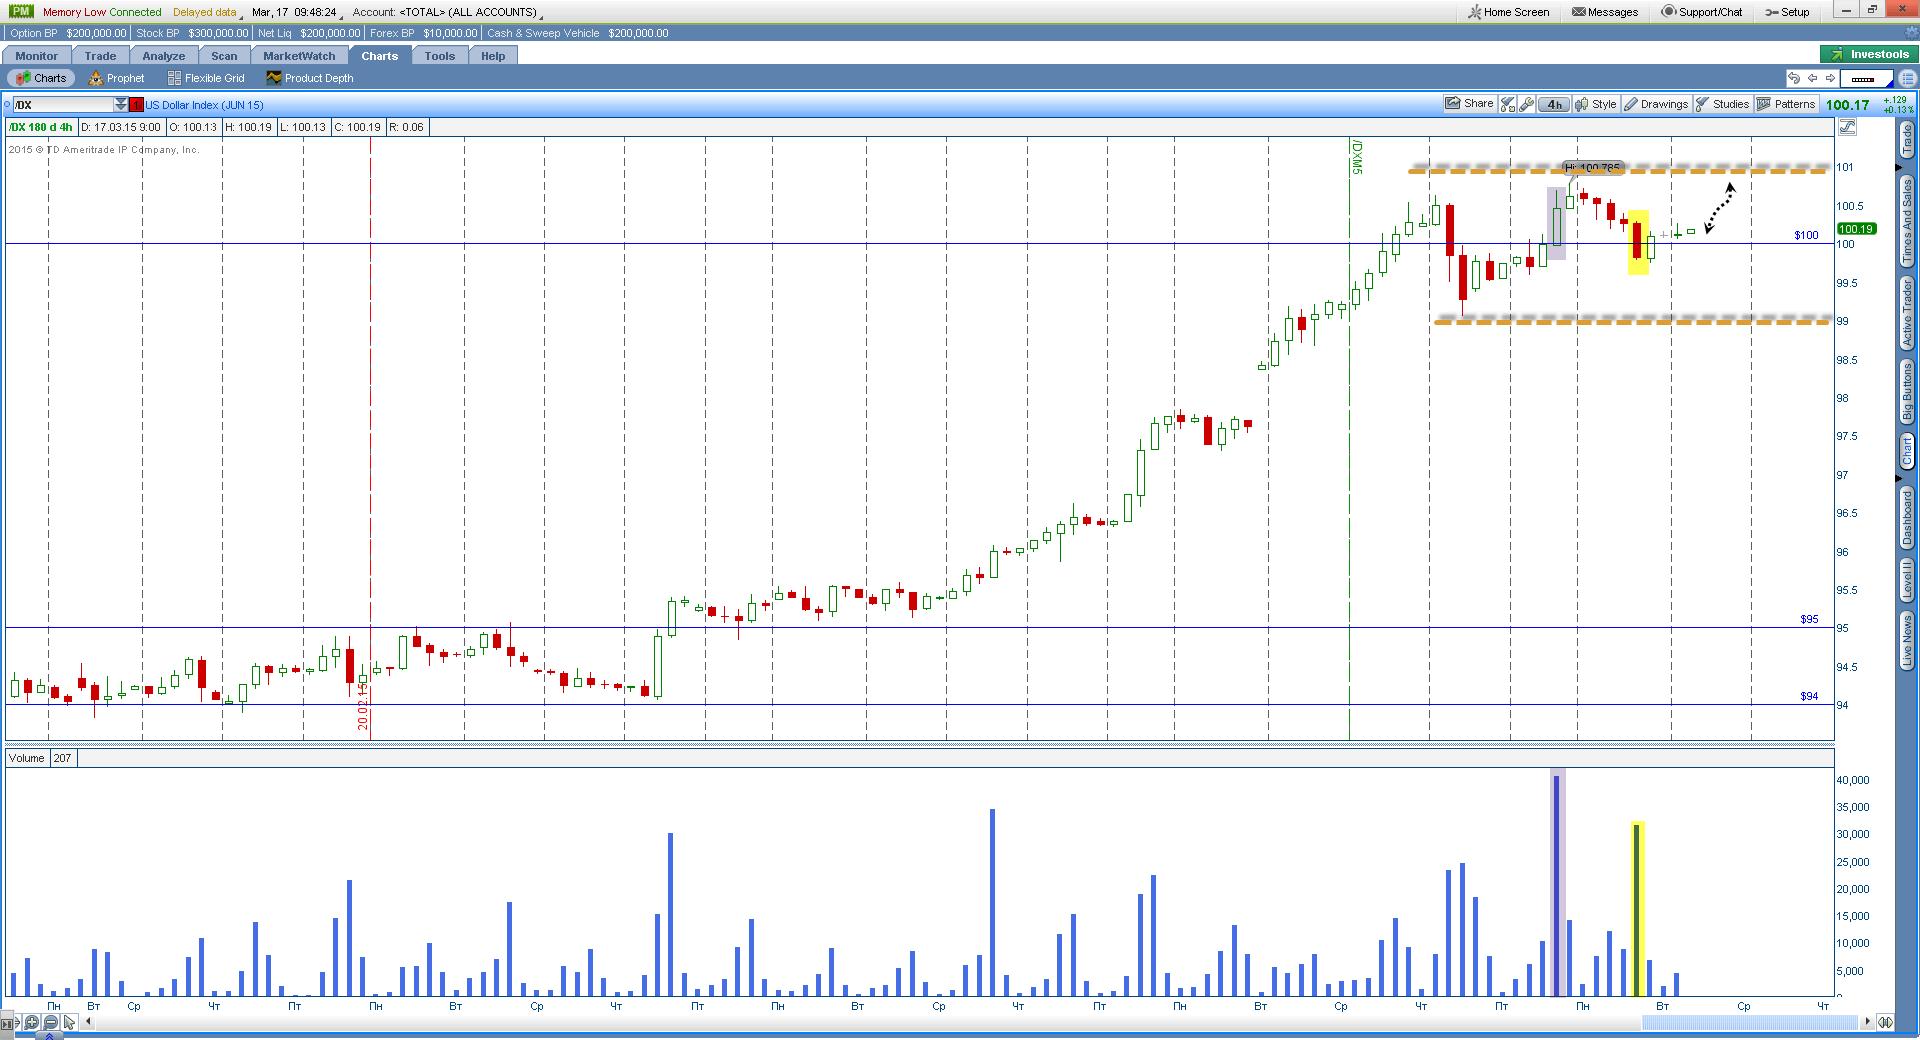 DX-17-03-2015 8-48-27